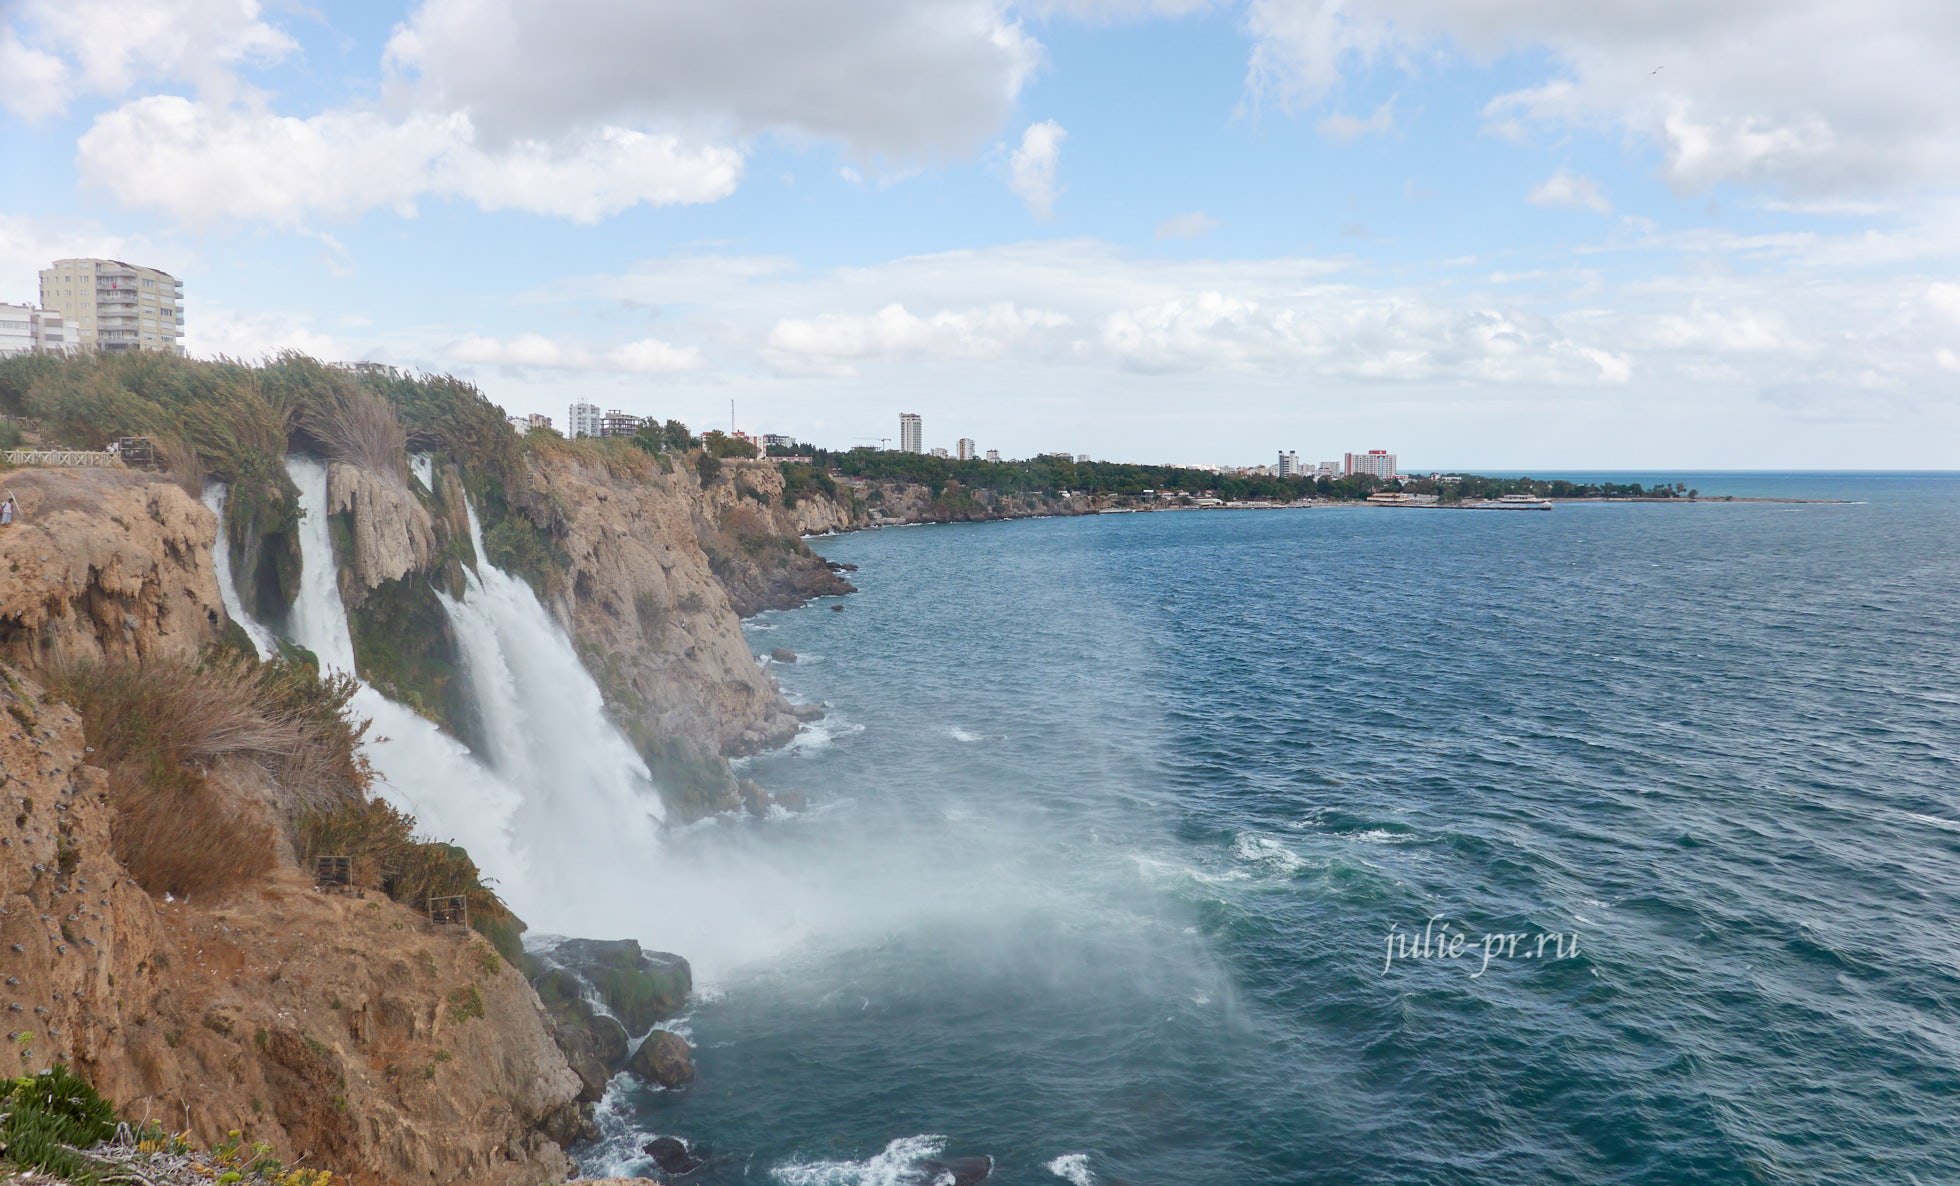 Турция, Анталья, Нижний Дюденский водопад